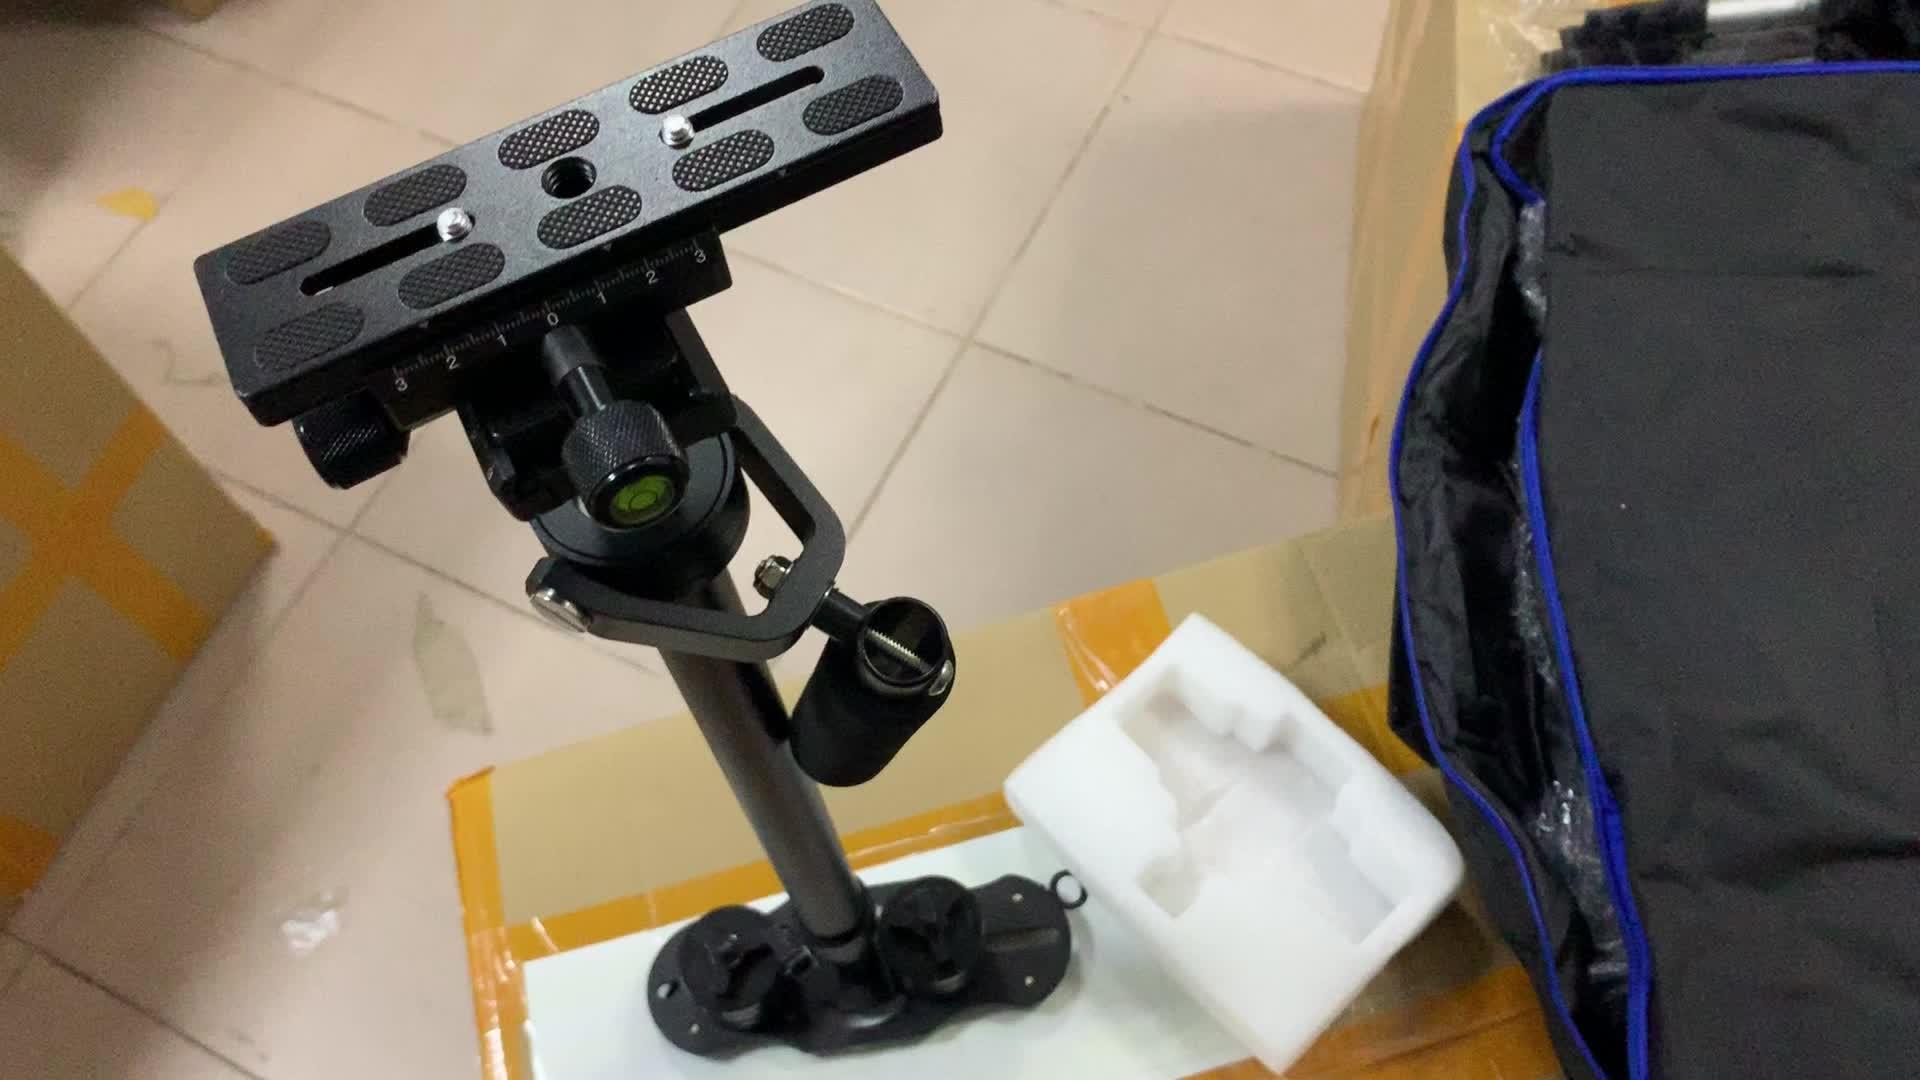 S40 プロ黒調節可能なカメラスタンドステディカムハンドヘルドジャイロ眼スタビライザービデオ